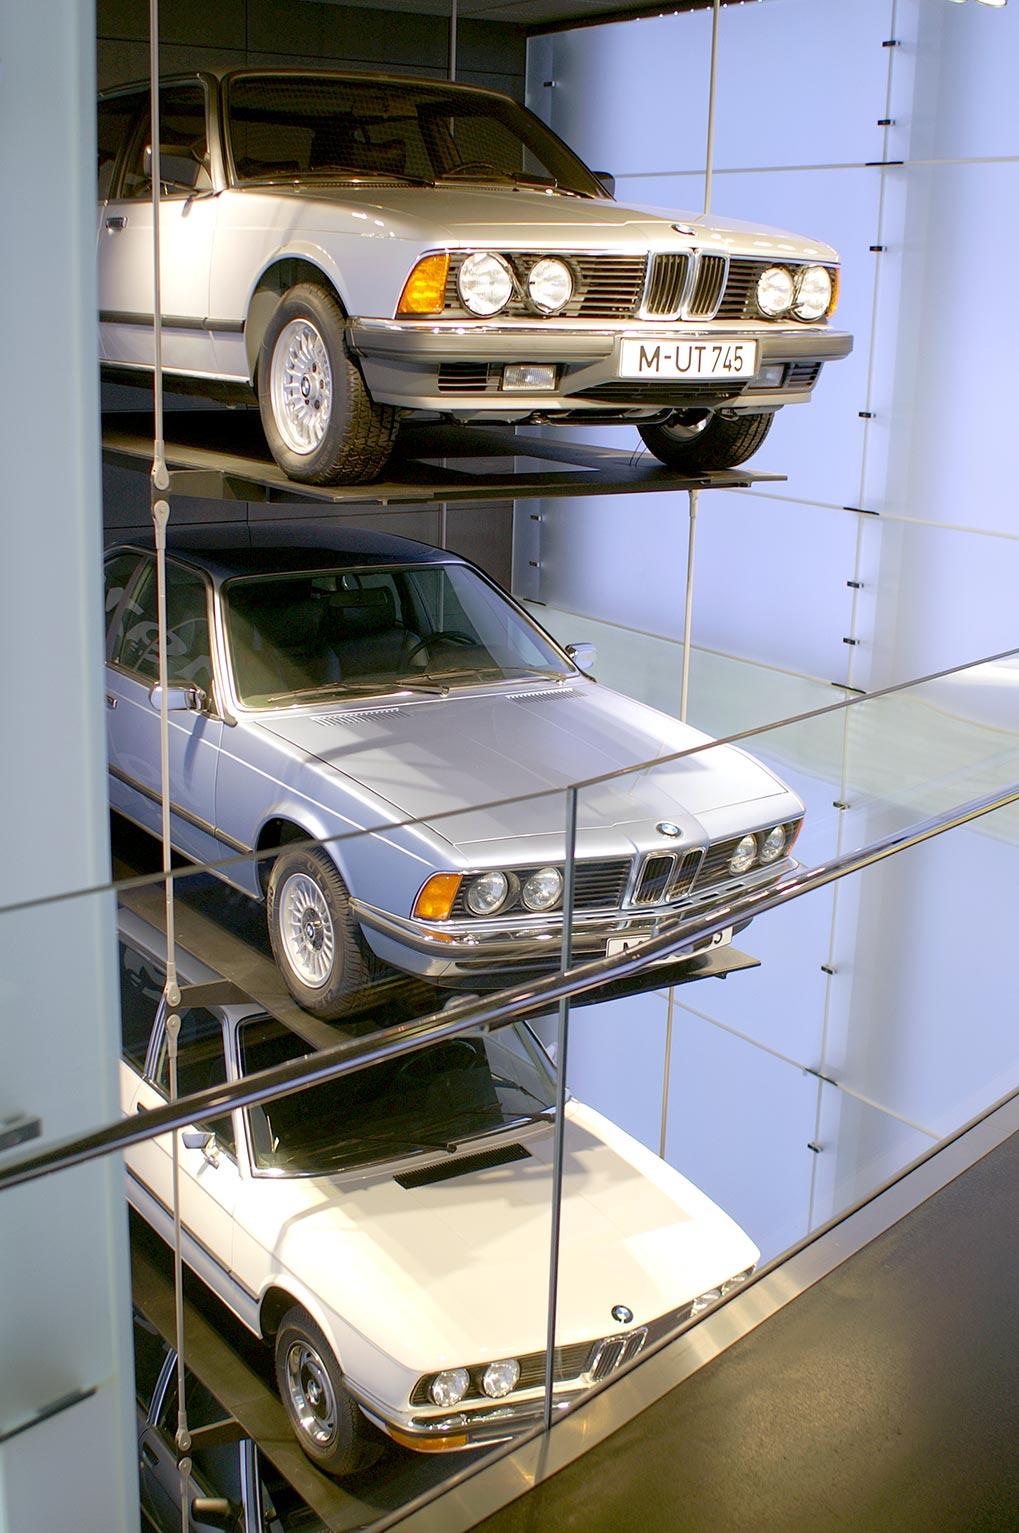 BMW Museum 5 series